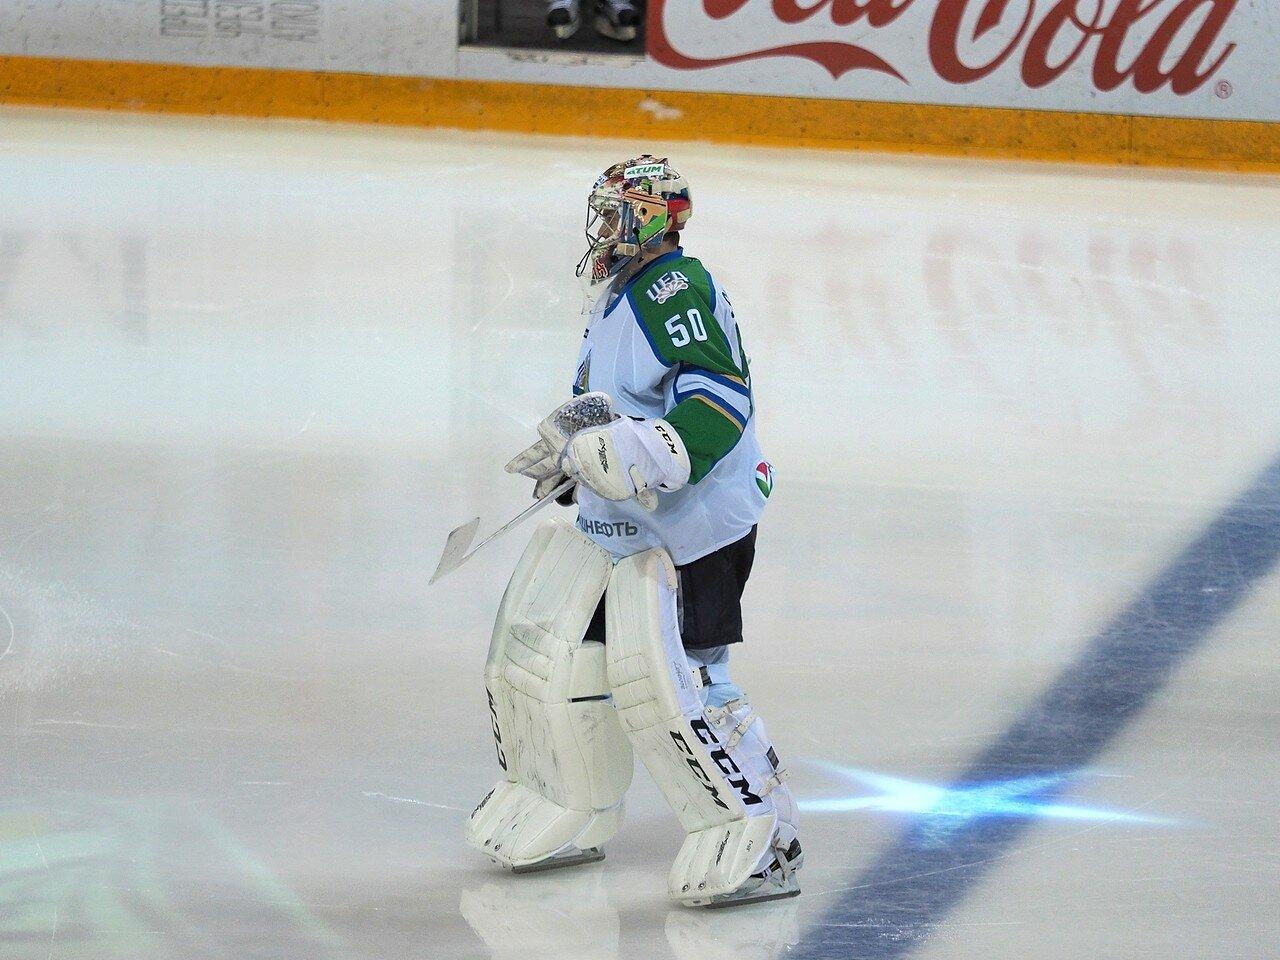 48Плей-офф 2016 Восток Финал Металлург - Салават Юлаев 25.03.2016